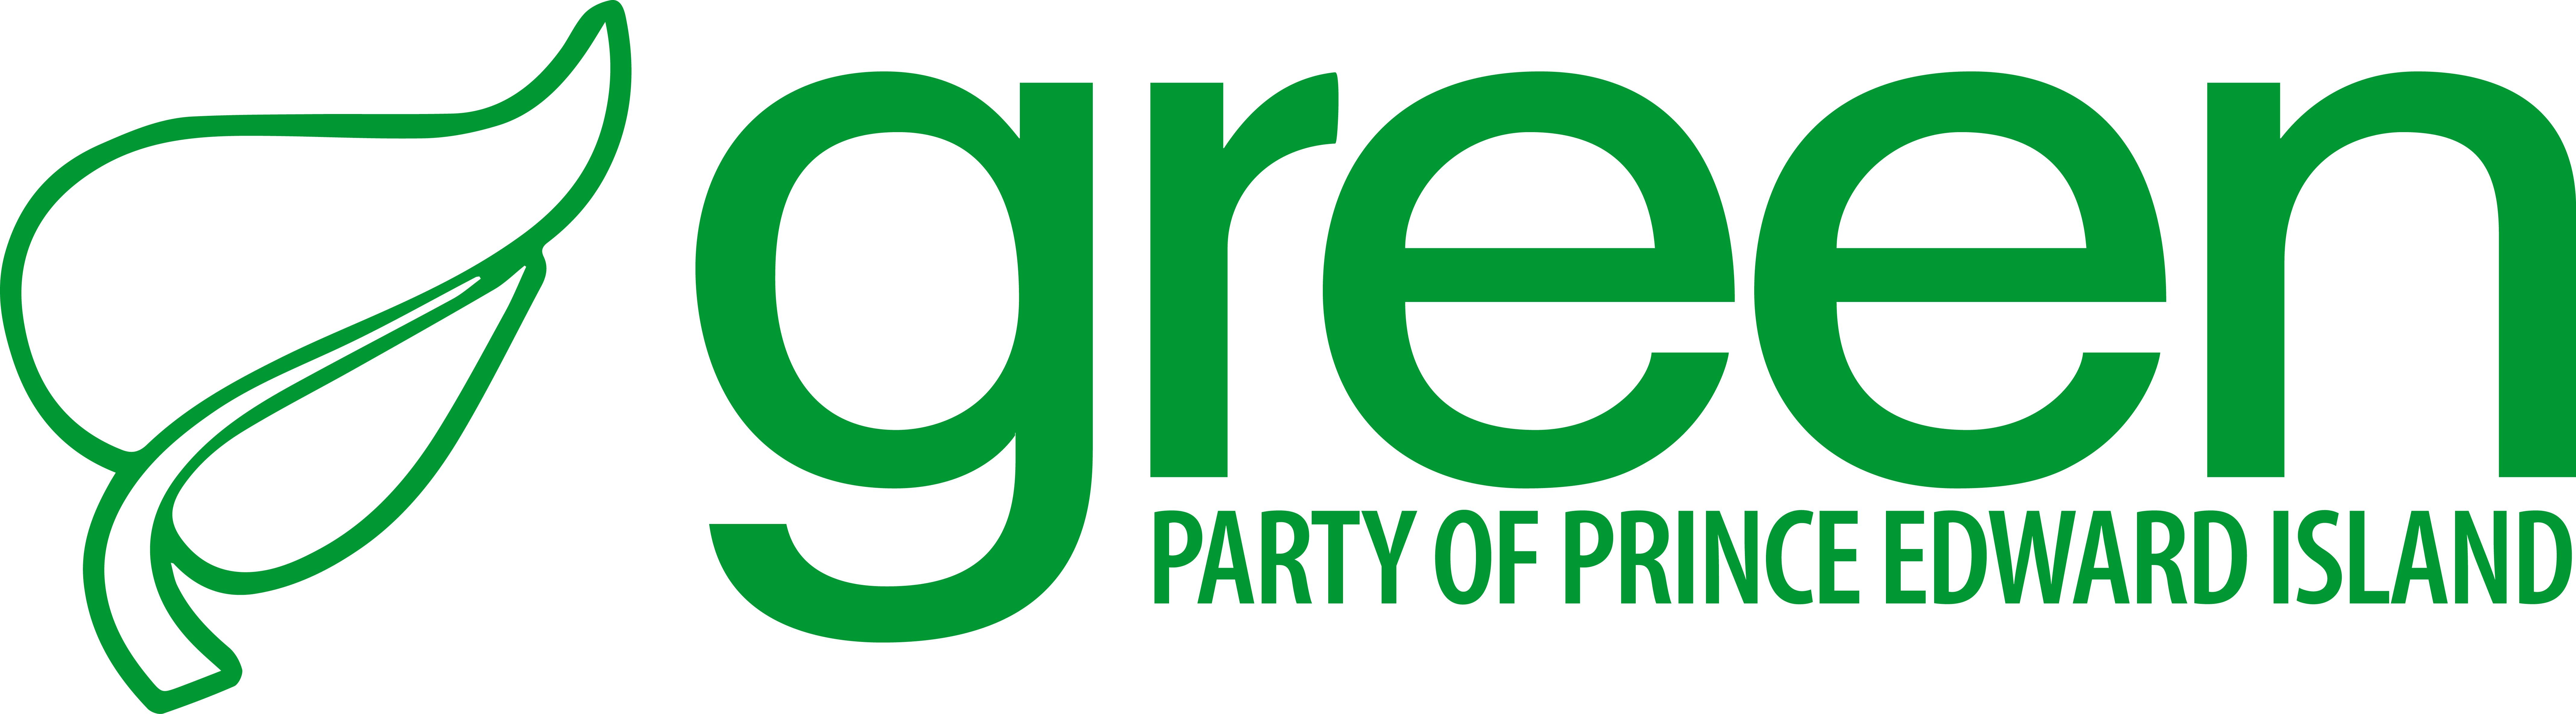 GPPEI_logo_green_on_transparent.png